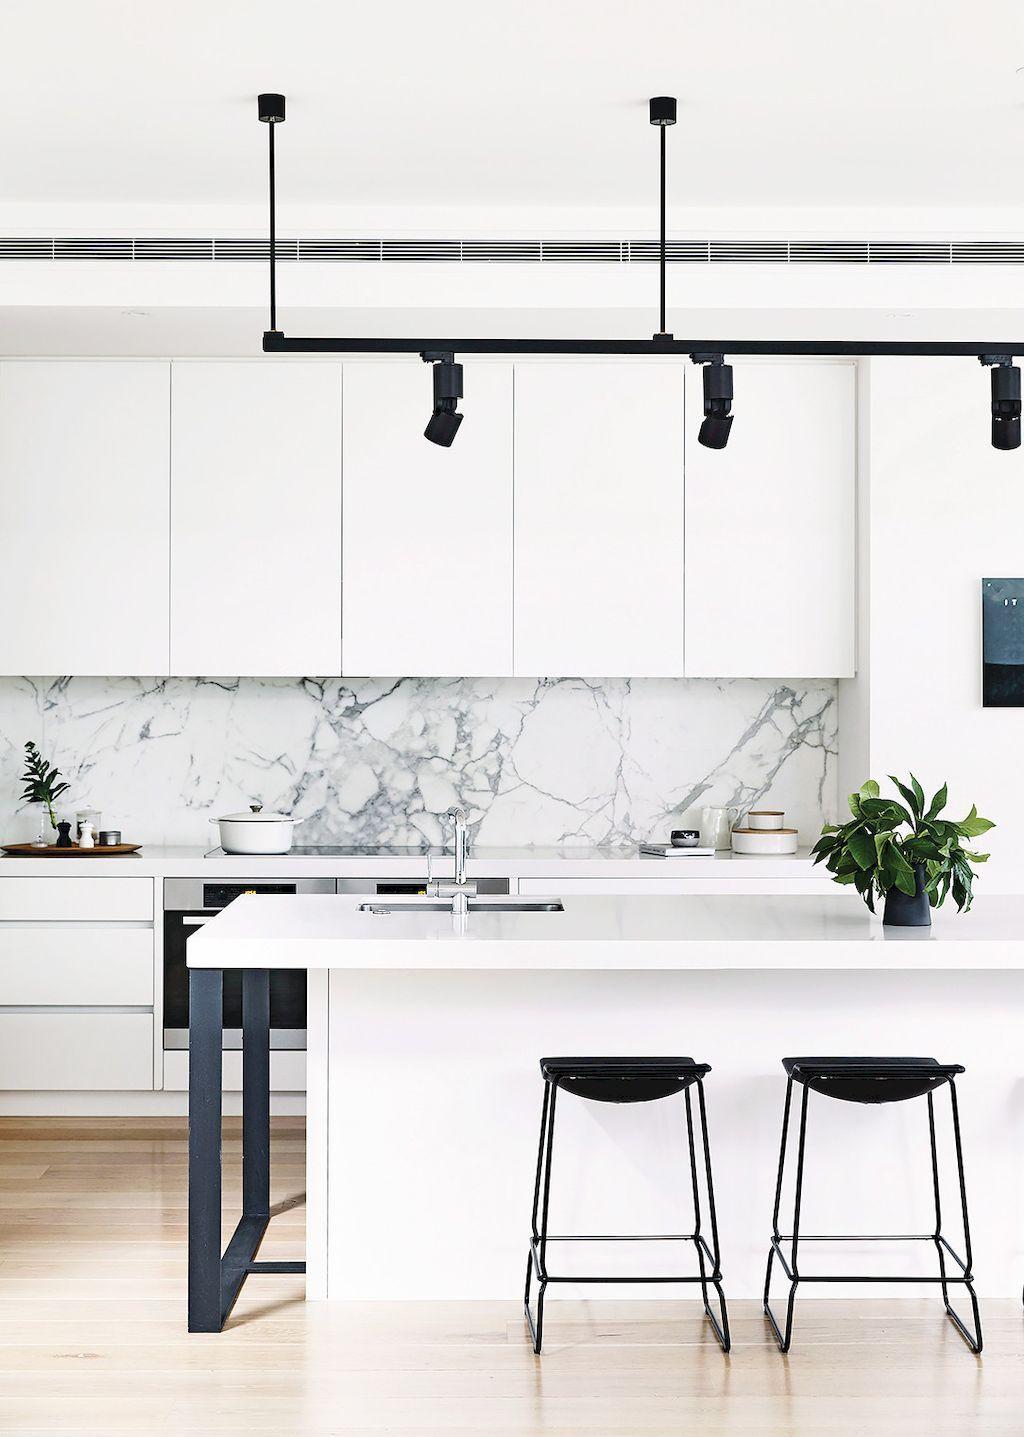 40 Minimalist Home Decoration Ideas | Cocina moderna, Minimalismo y ...